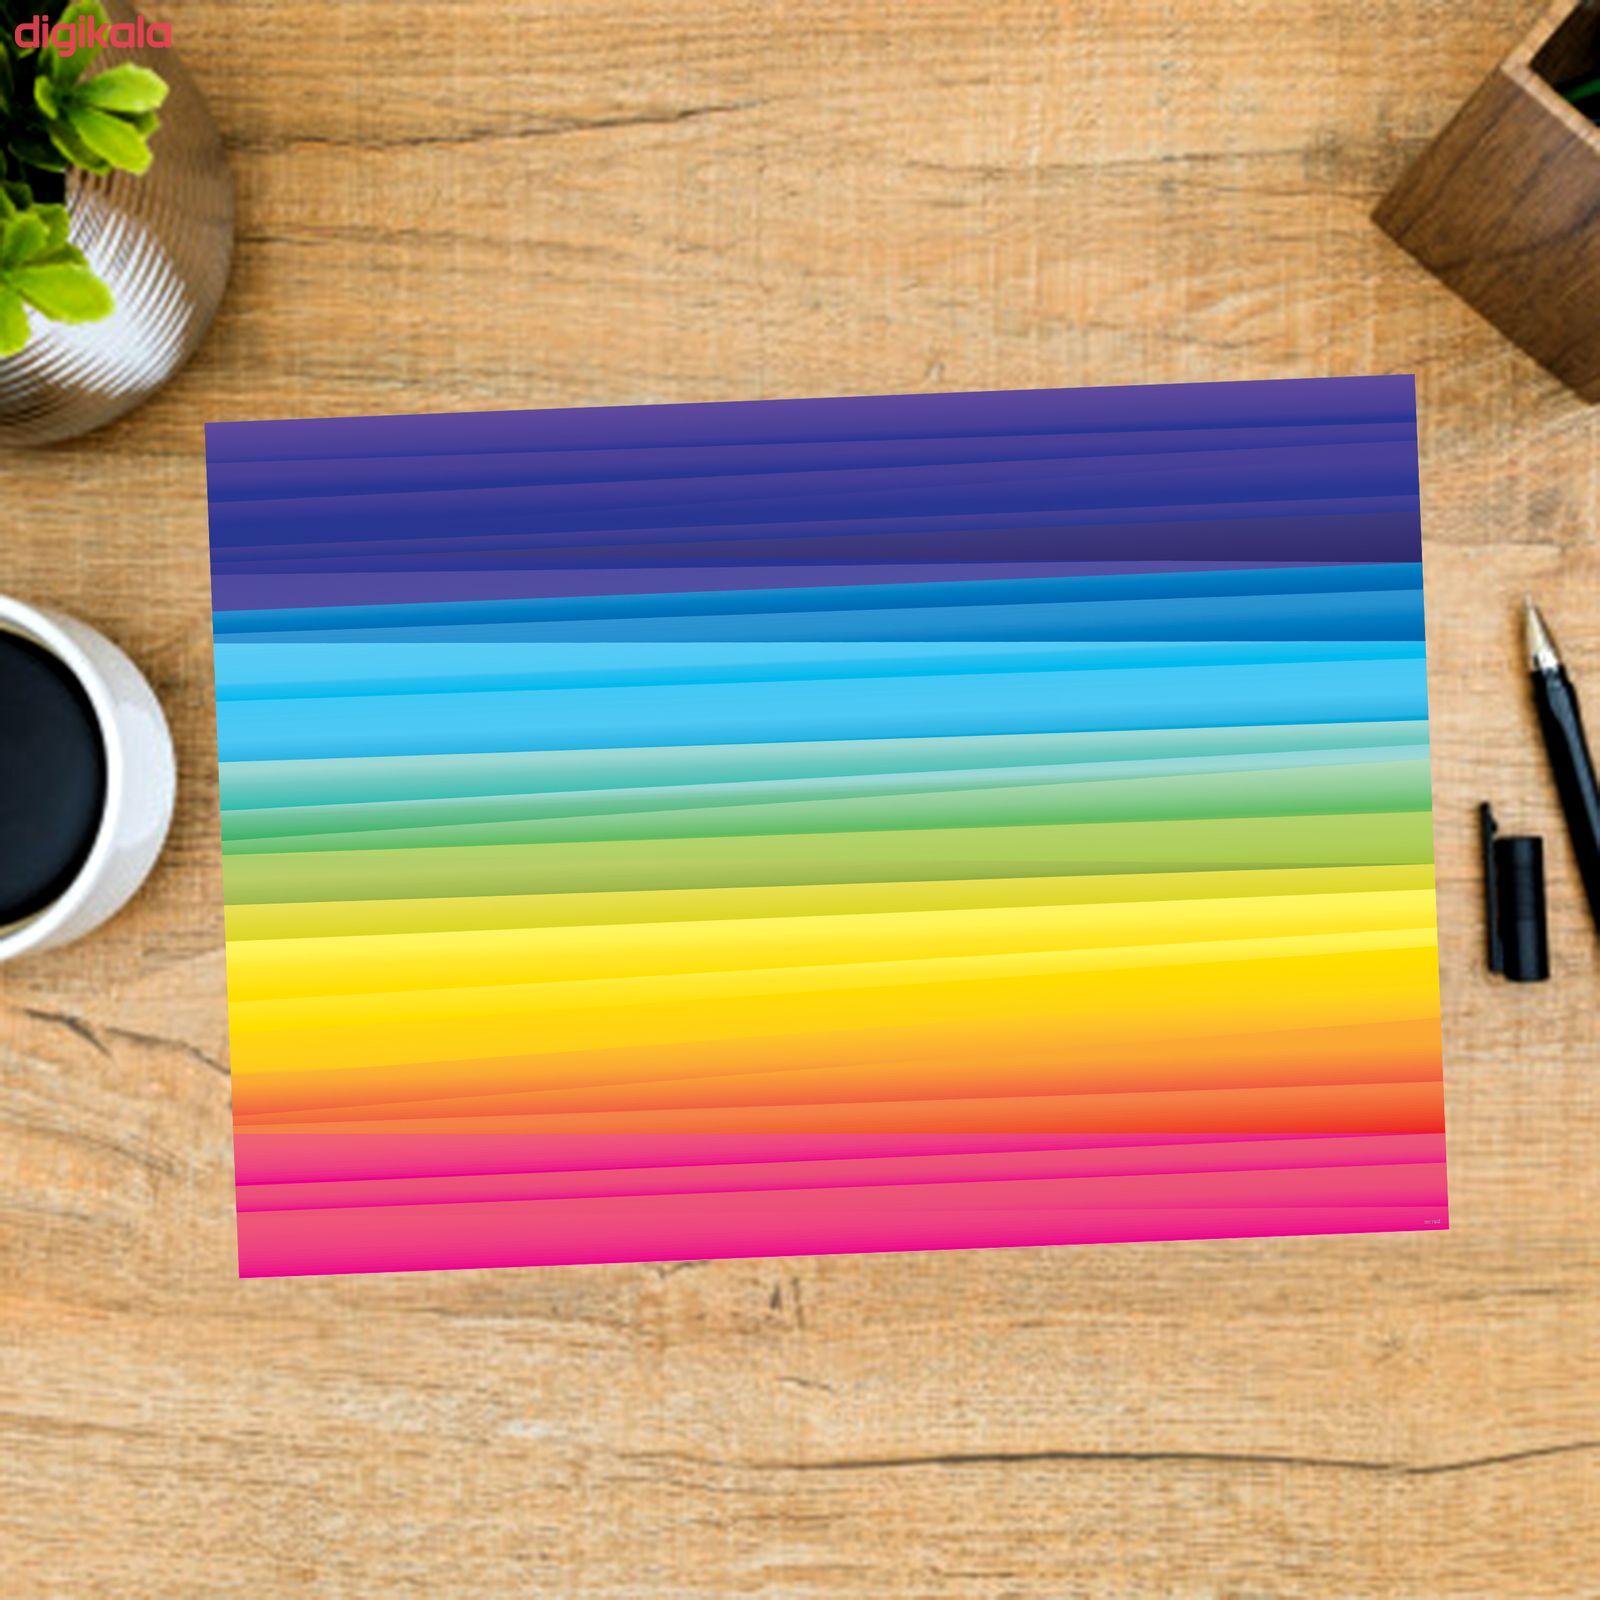 کاغذ رنگی A4 مستر راد مدل رنگارنگ بسته 10 عددی main 1 8